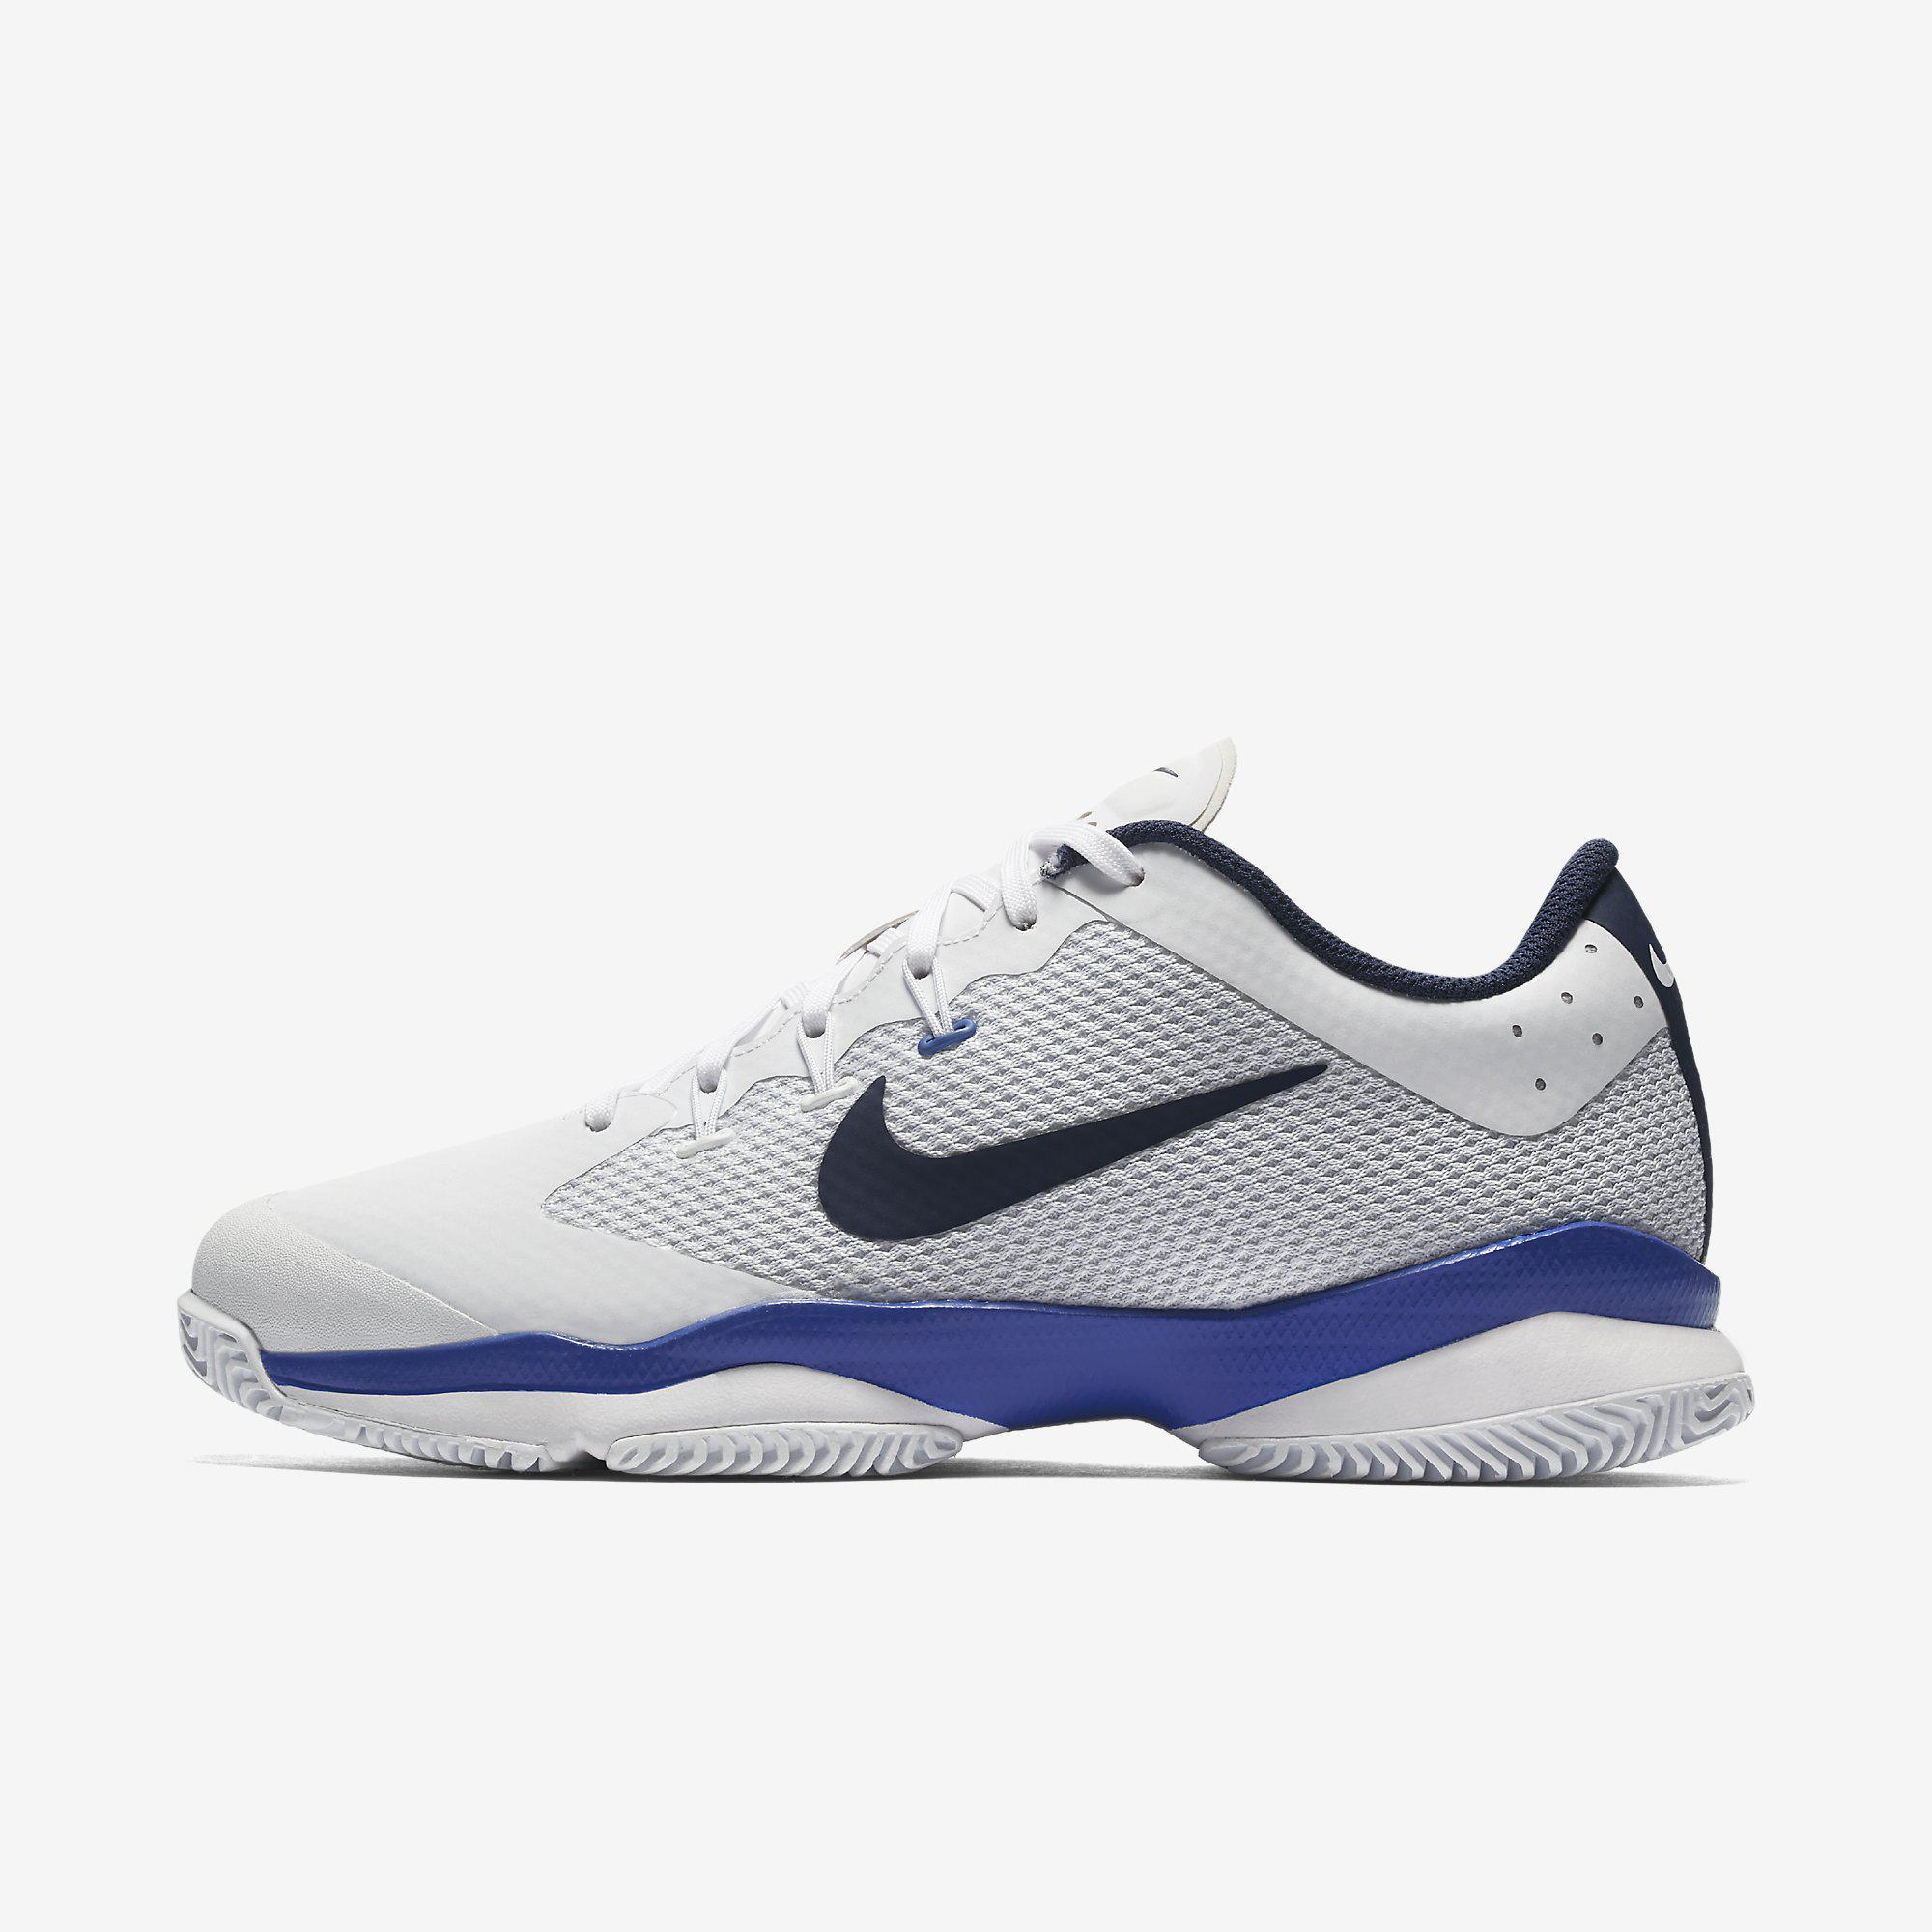 nike womens air zoom ultra tennis shoes  whitebinary